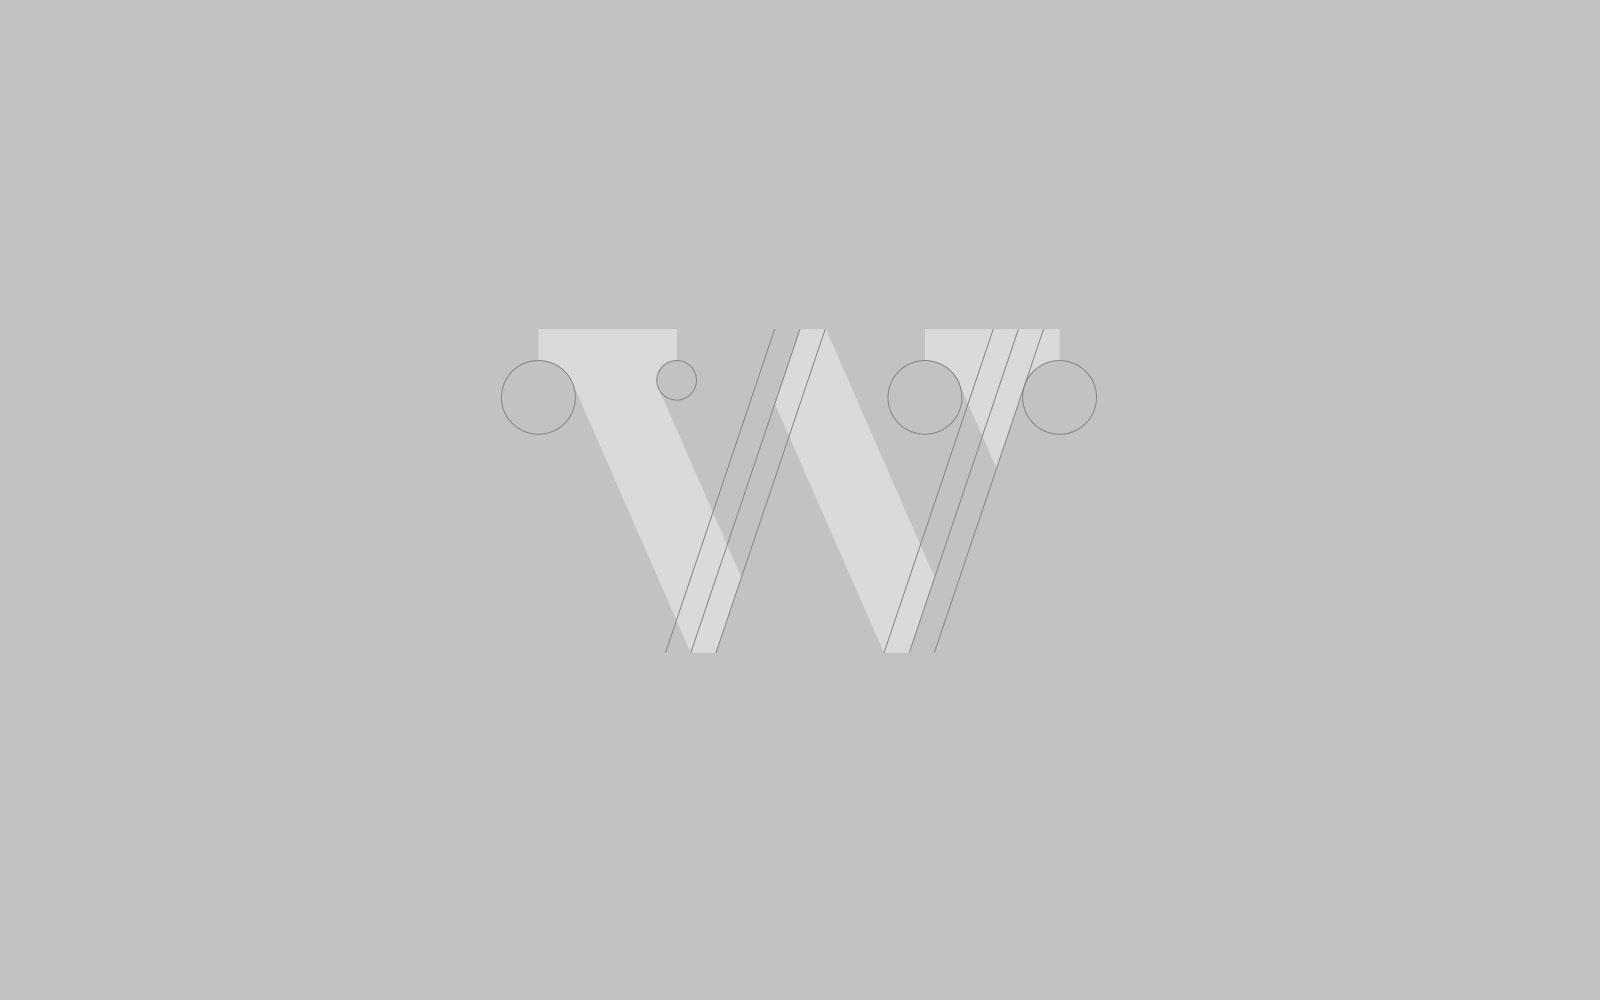 wagner_herleitung_logo_1600p